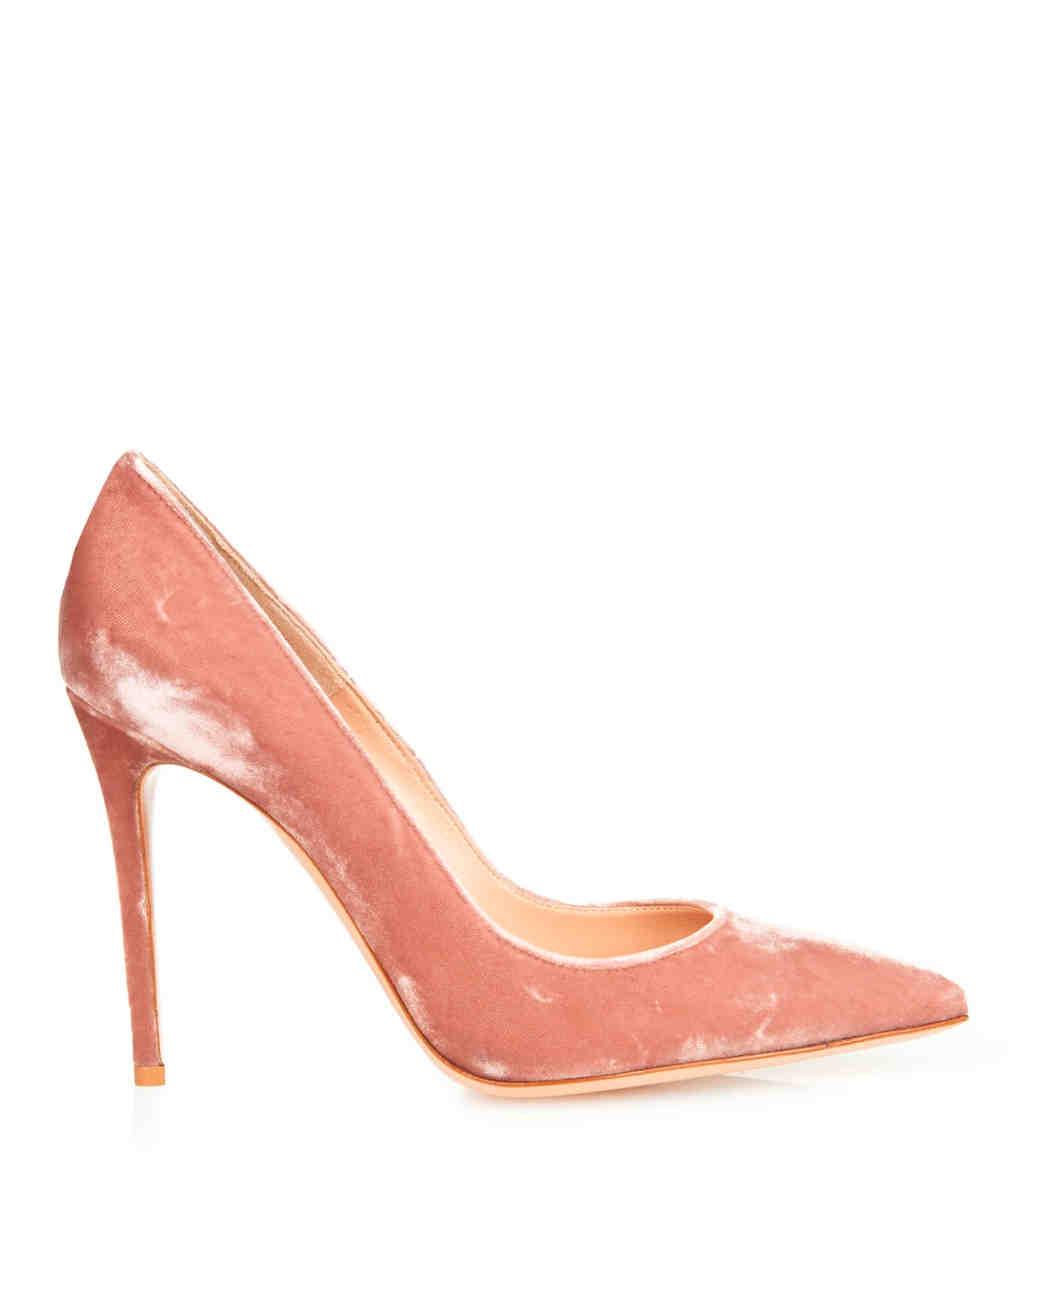 closed-toe-wedding-shoes-gianvito-rossi-matchesfashion-1215.jpg